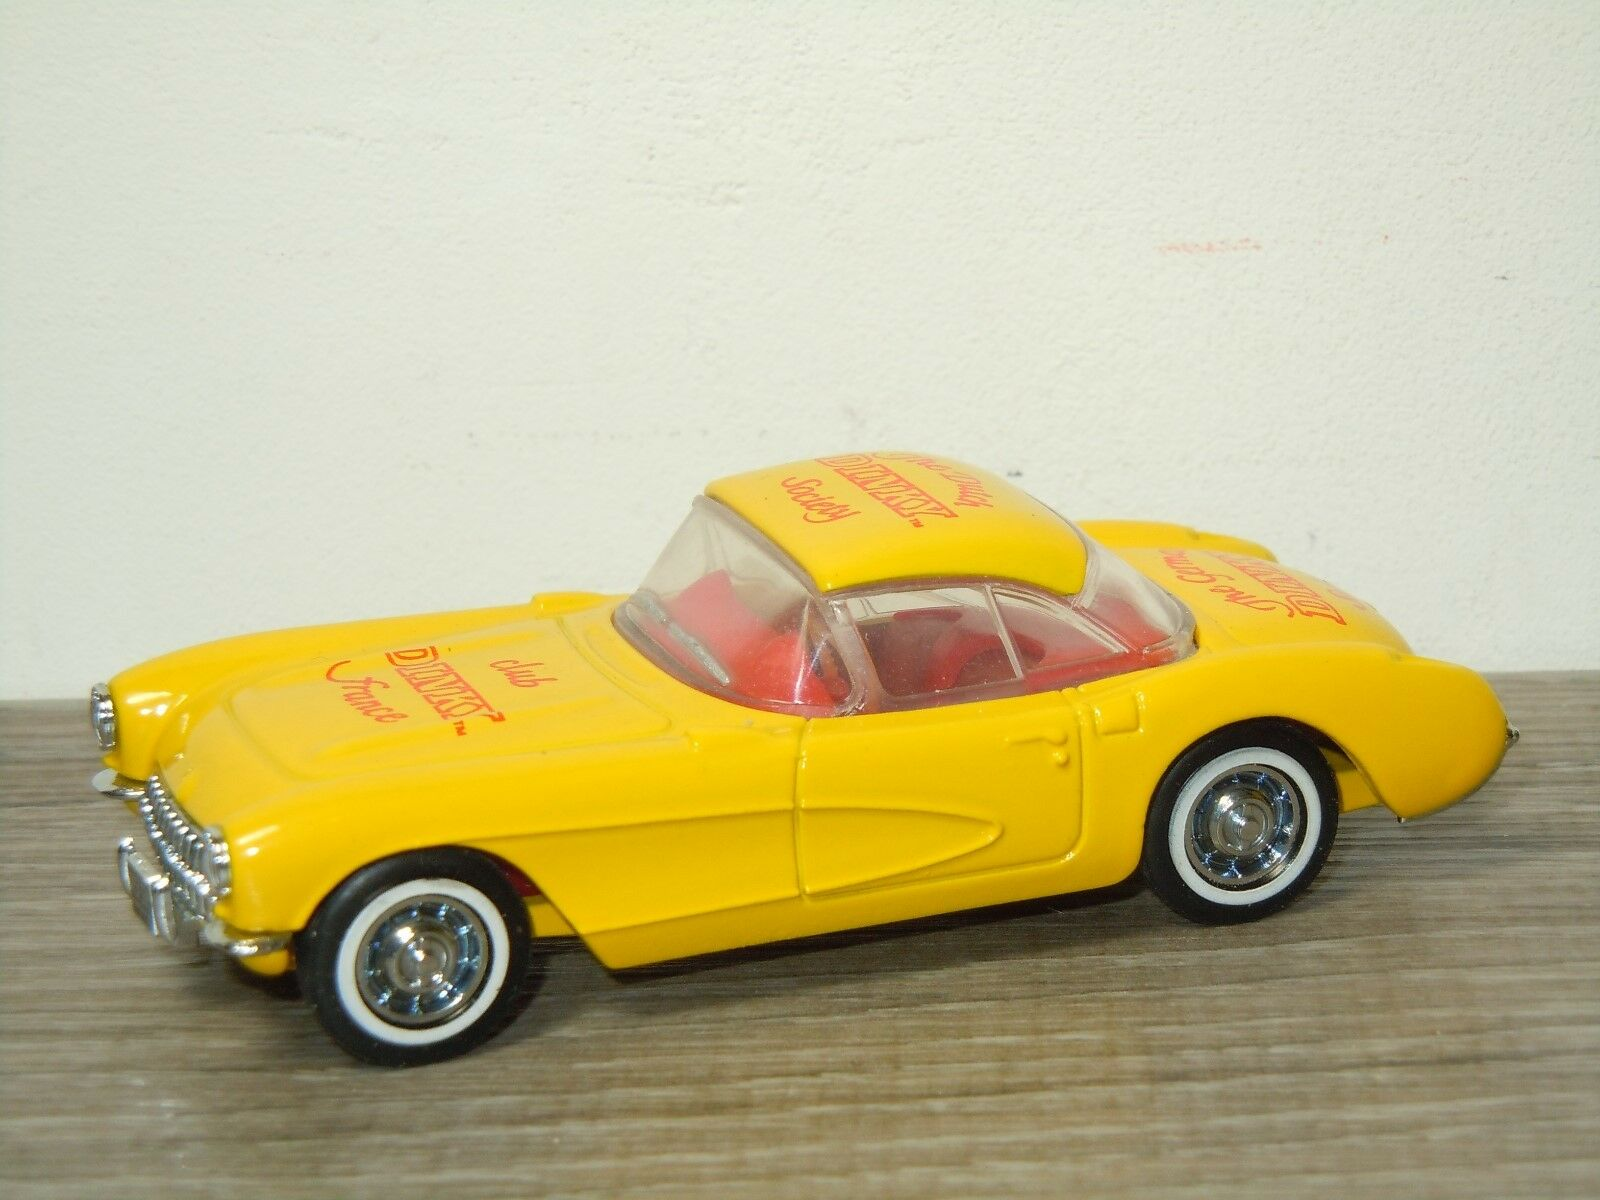 1956 Chevrolet Corvette The Dutch Dinky Society - Dinky DY Code 3 Model 30516